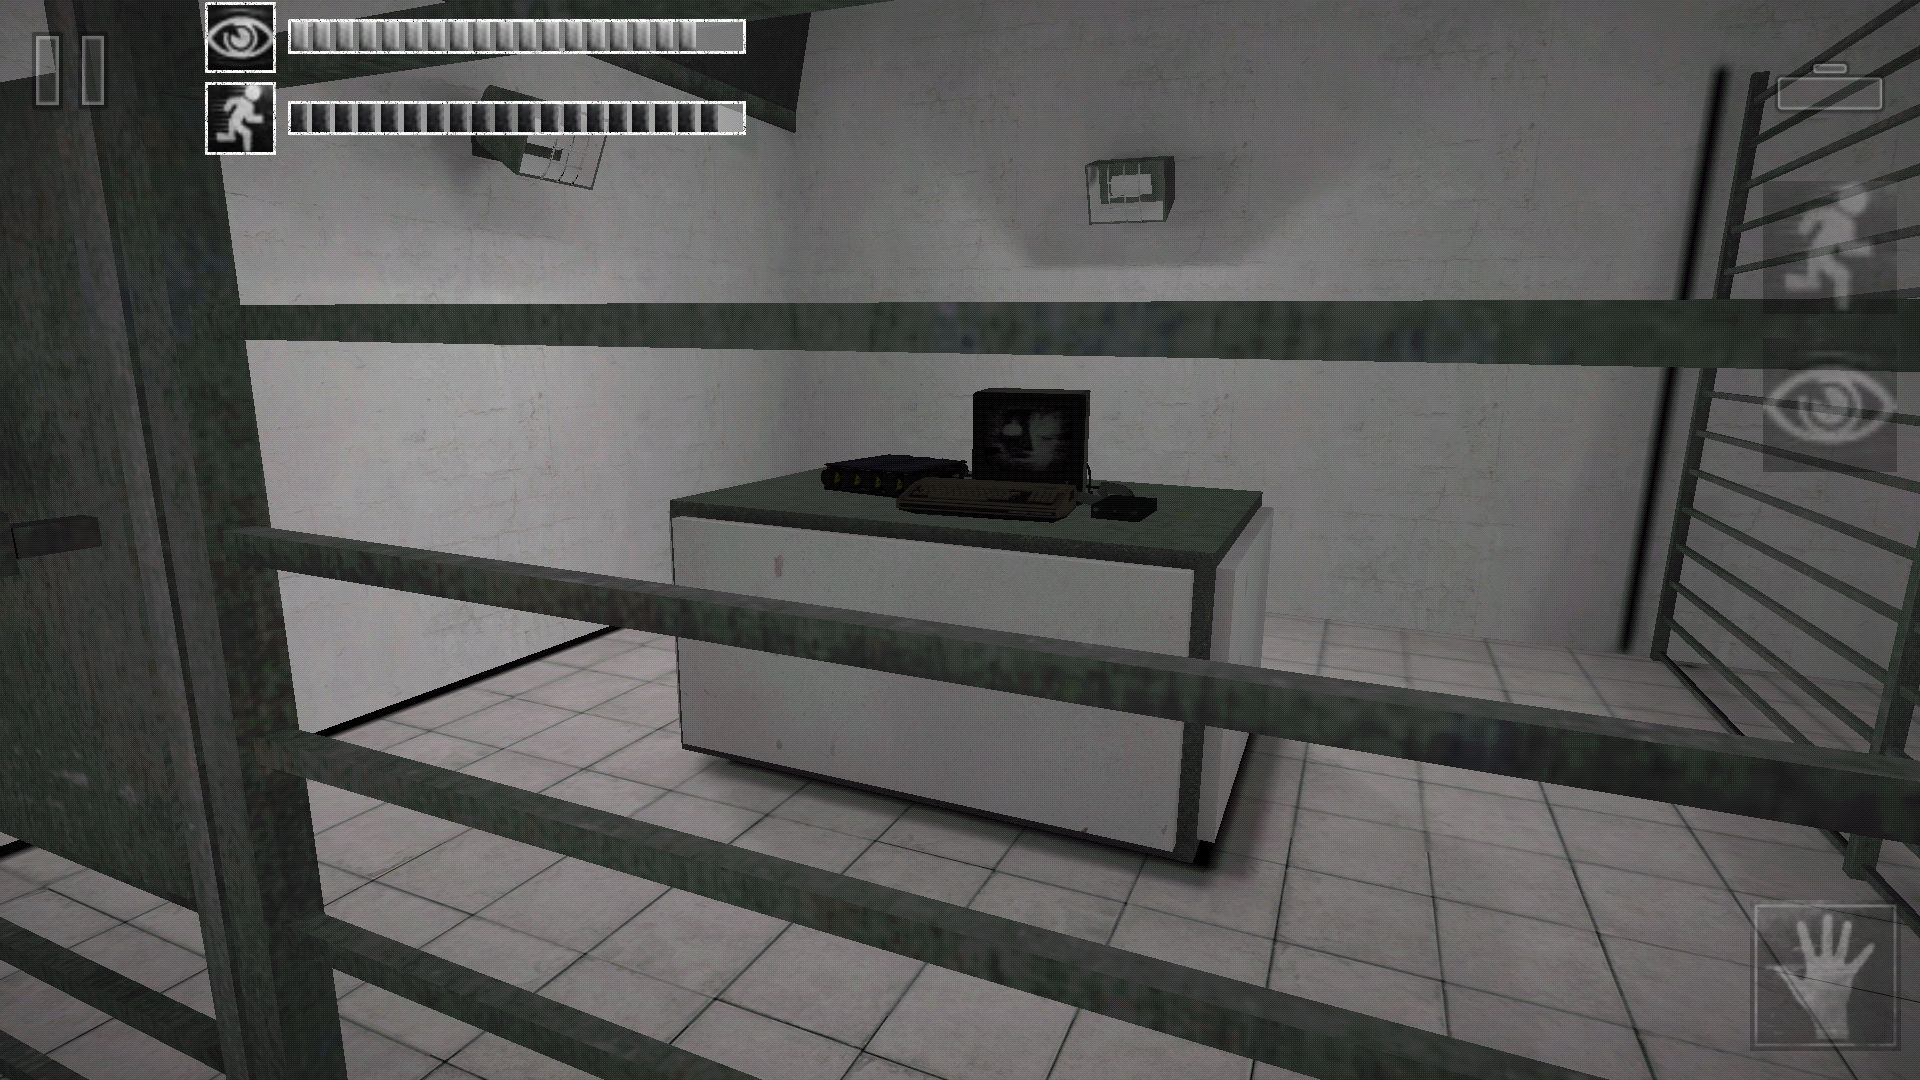 SCP - Containment Breach Mobile 游戏截图2